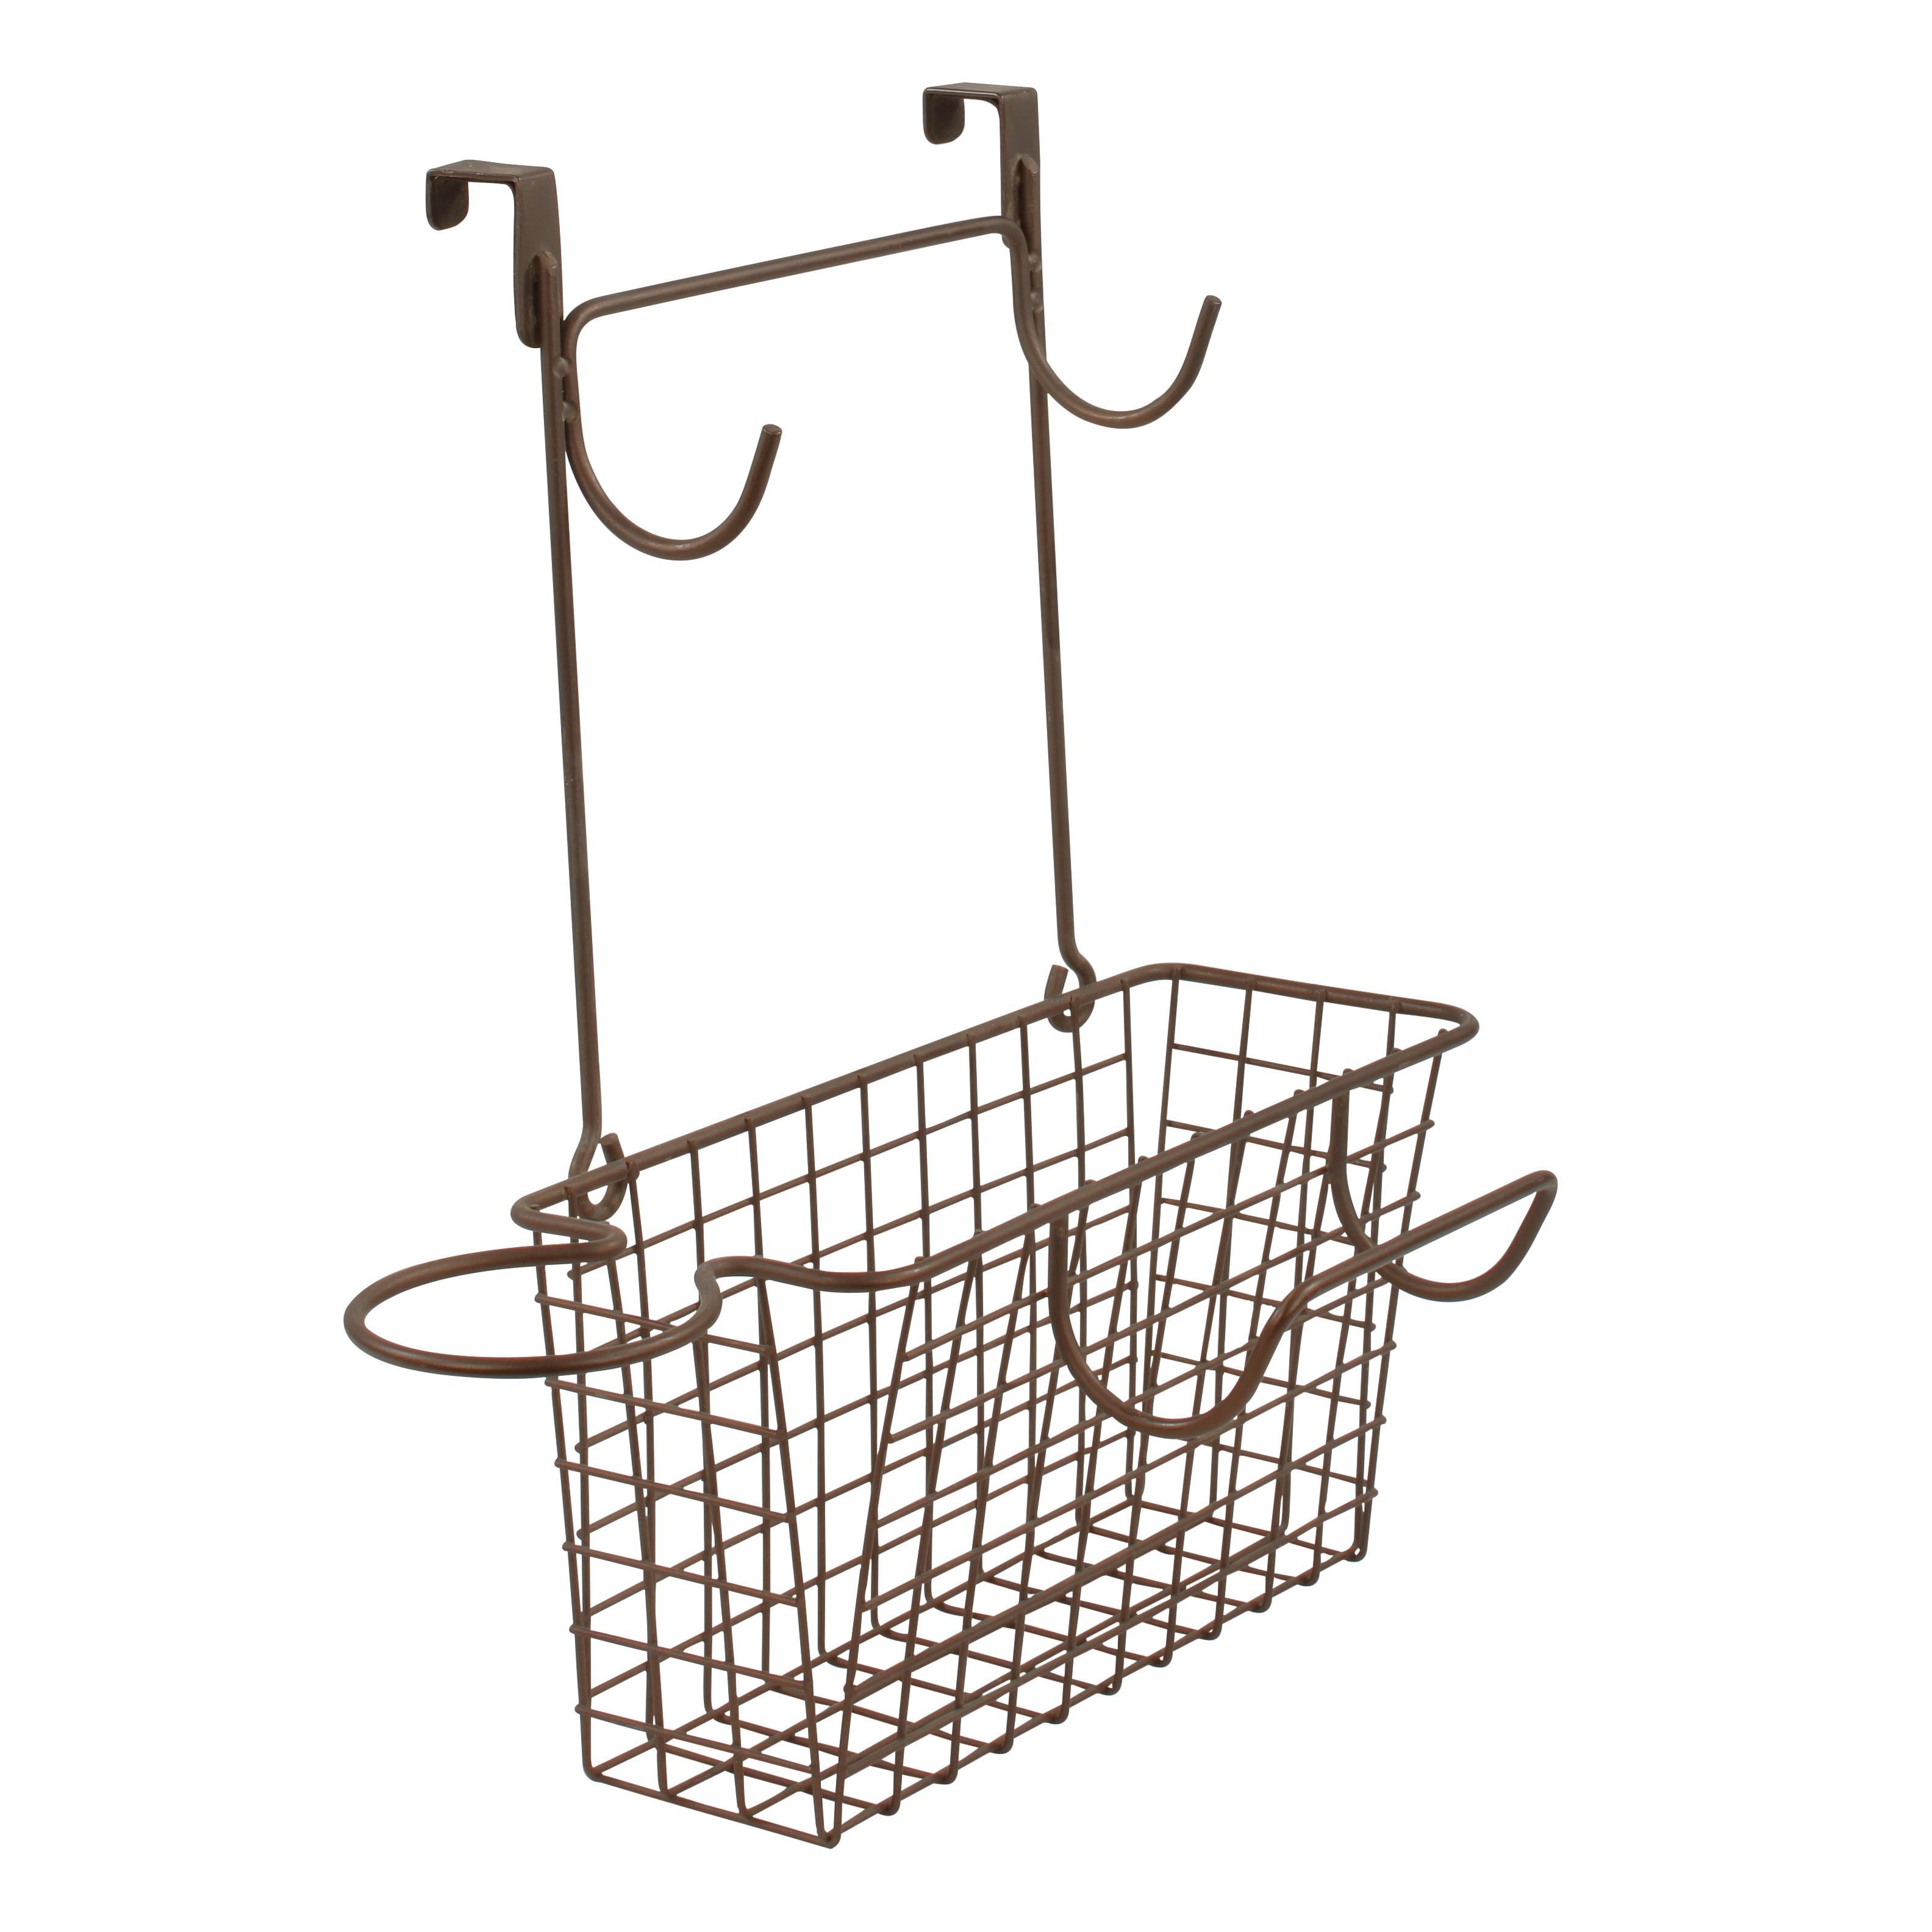 Over the Cabinet Spectrum Diversified Grid Storage Basket Medium Bronze